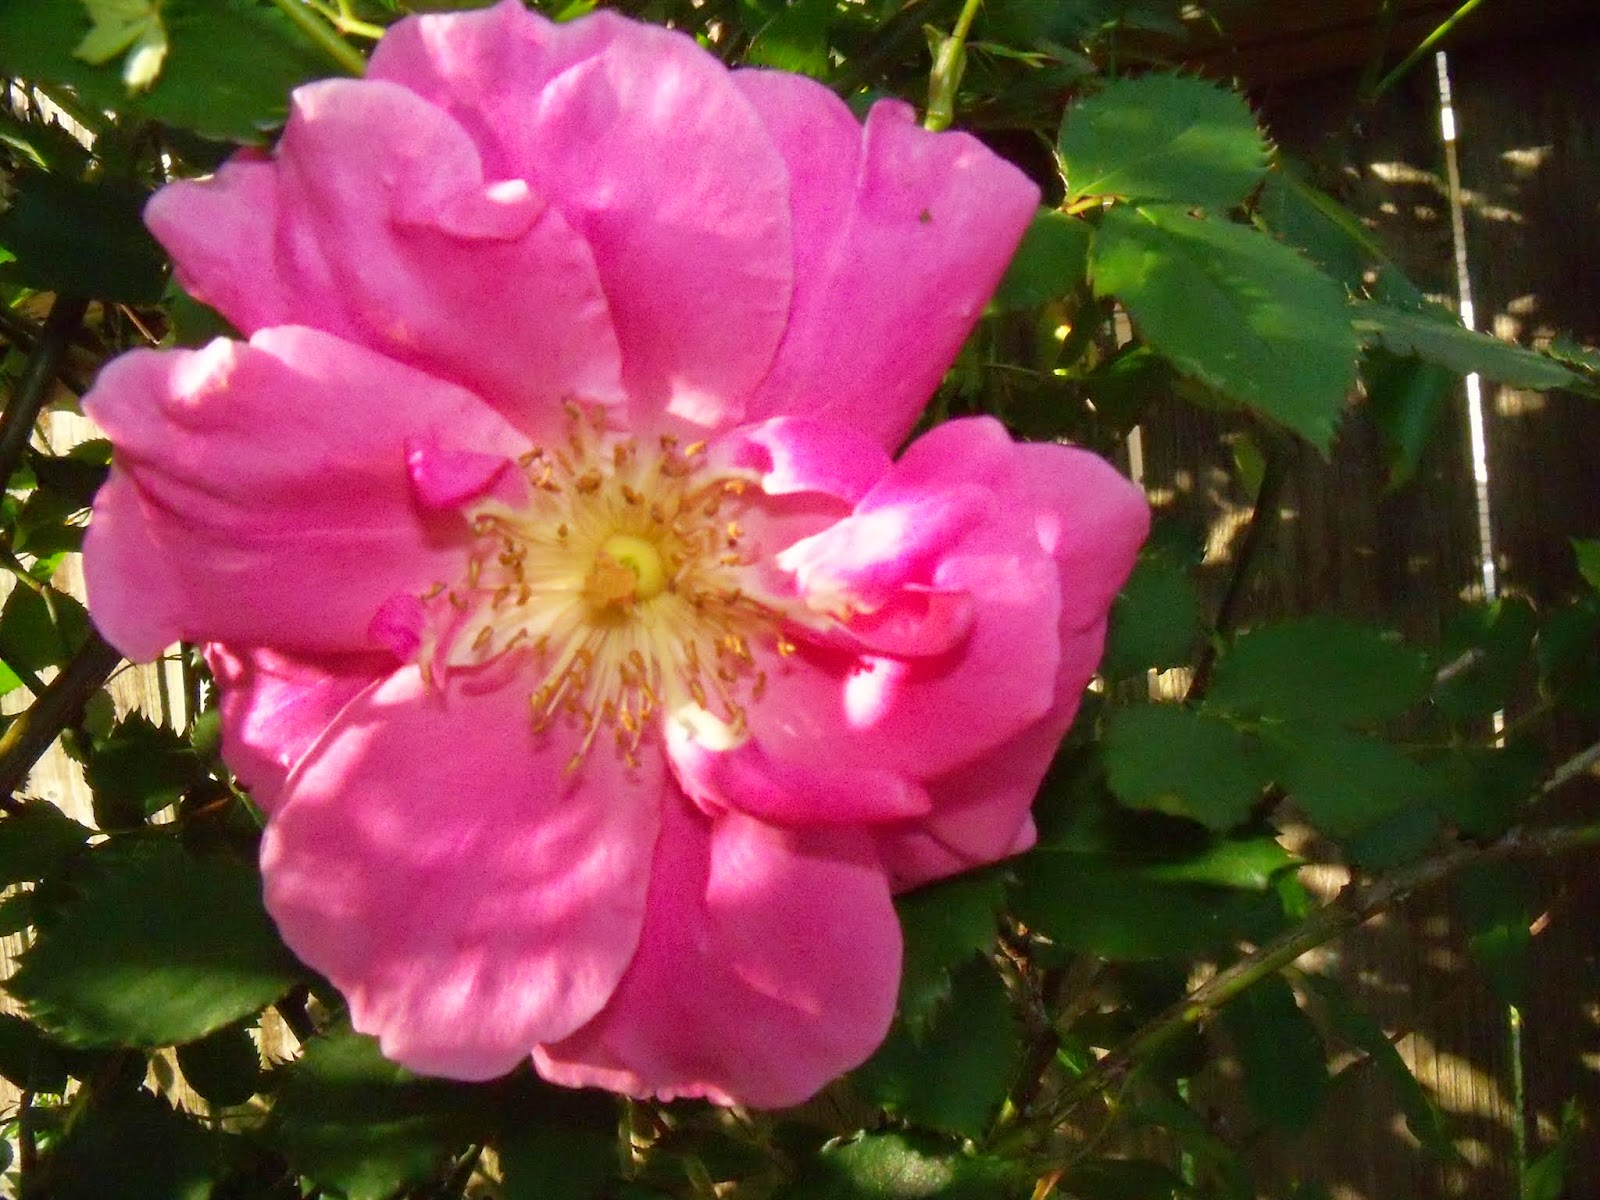 Gardening 2015 - 116_7640.JPG